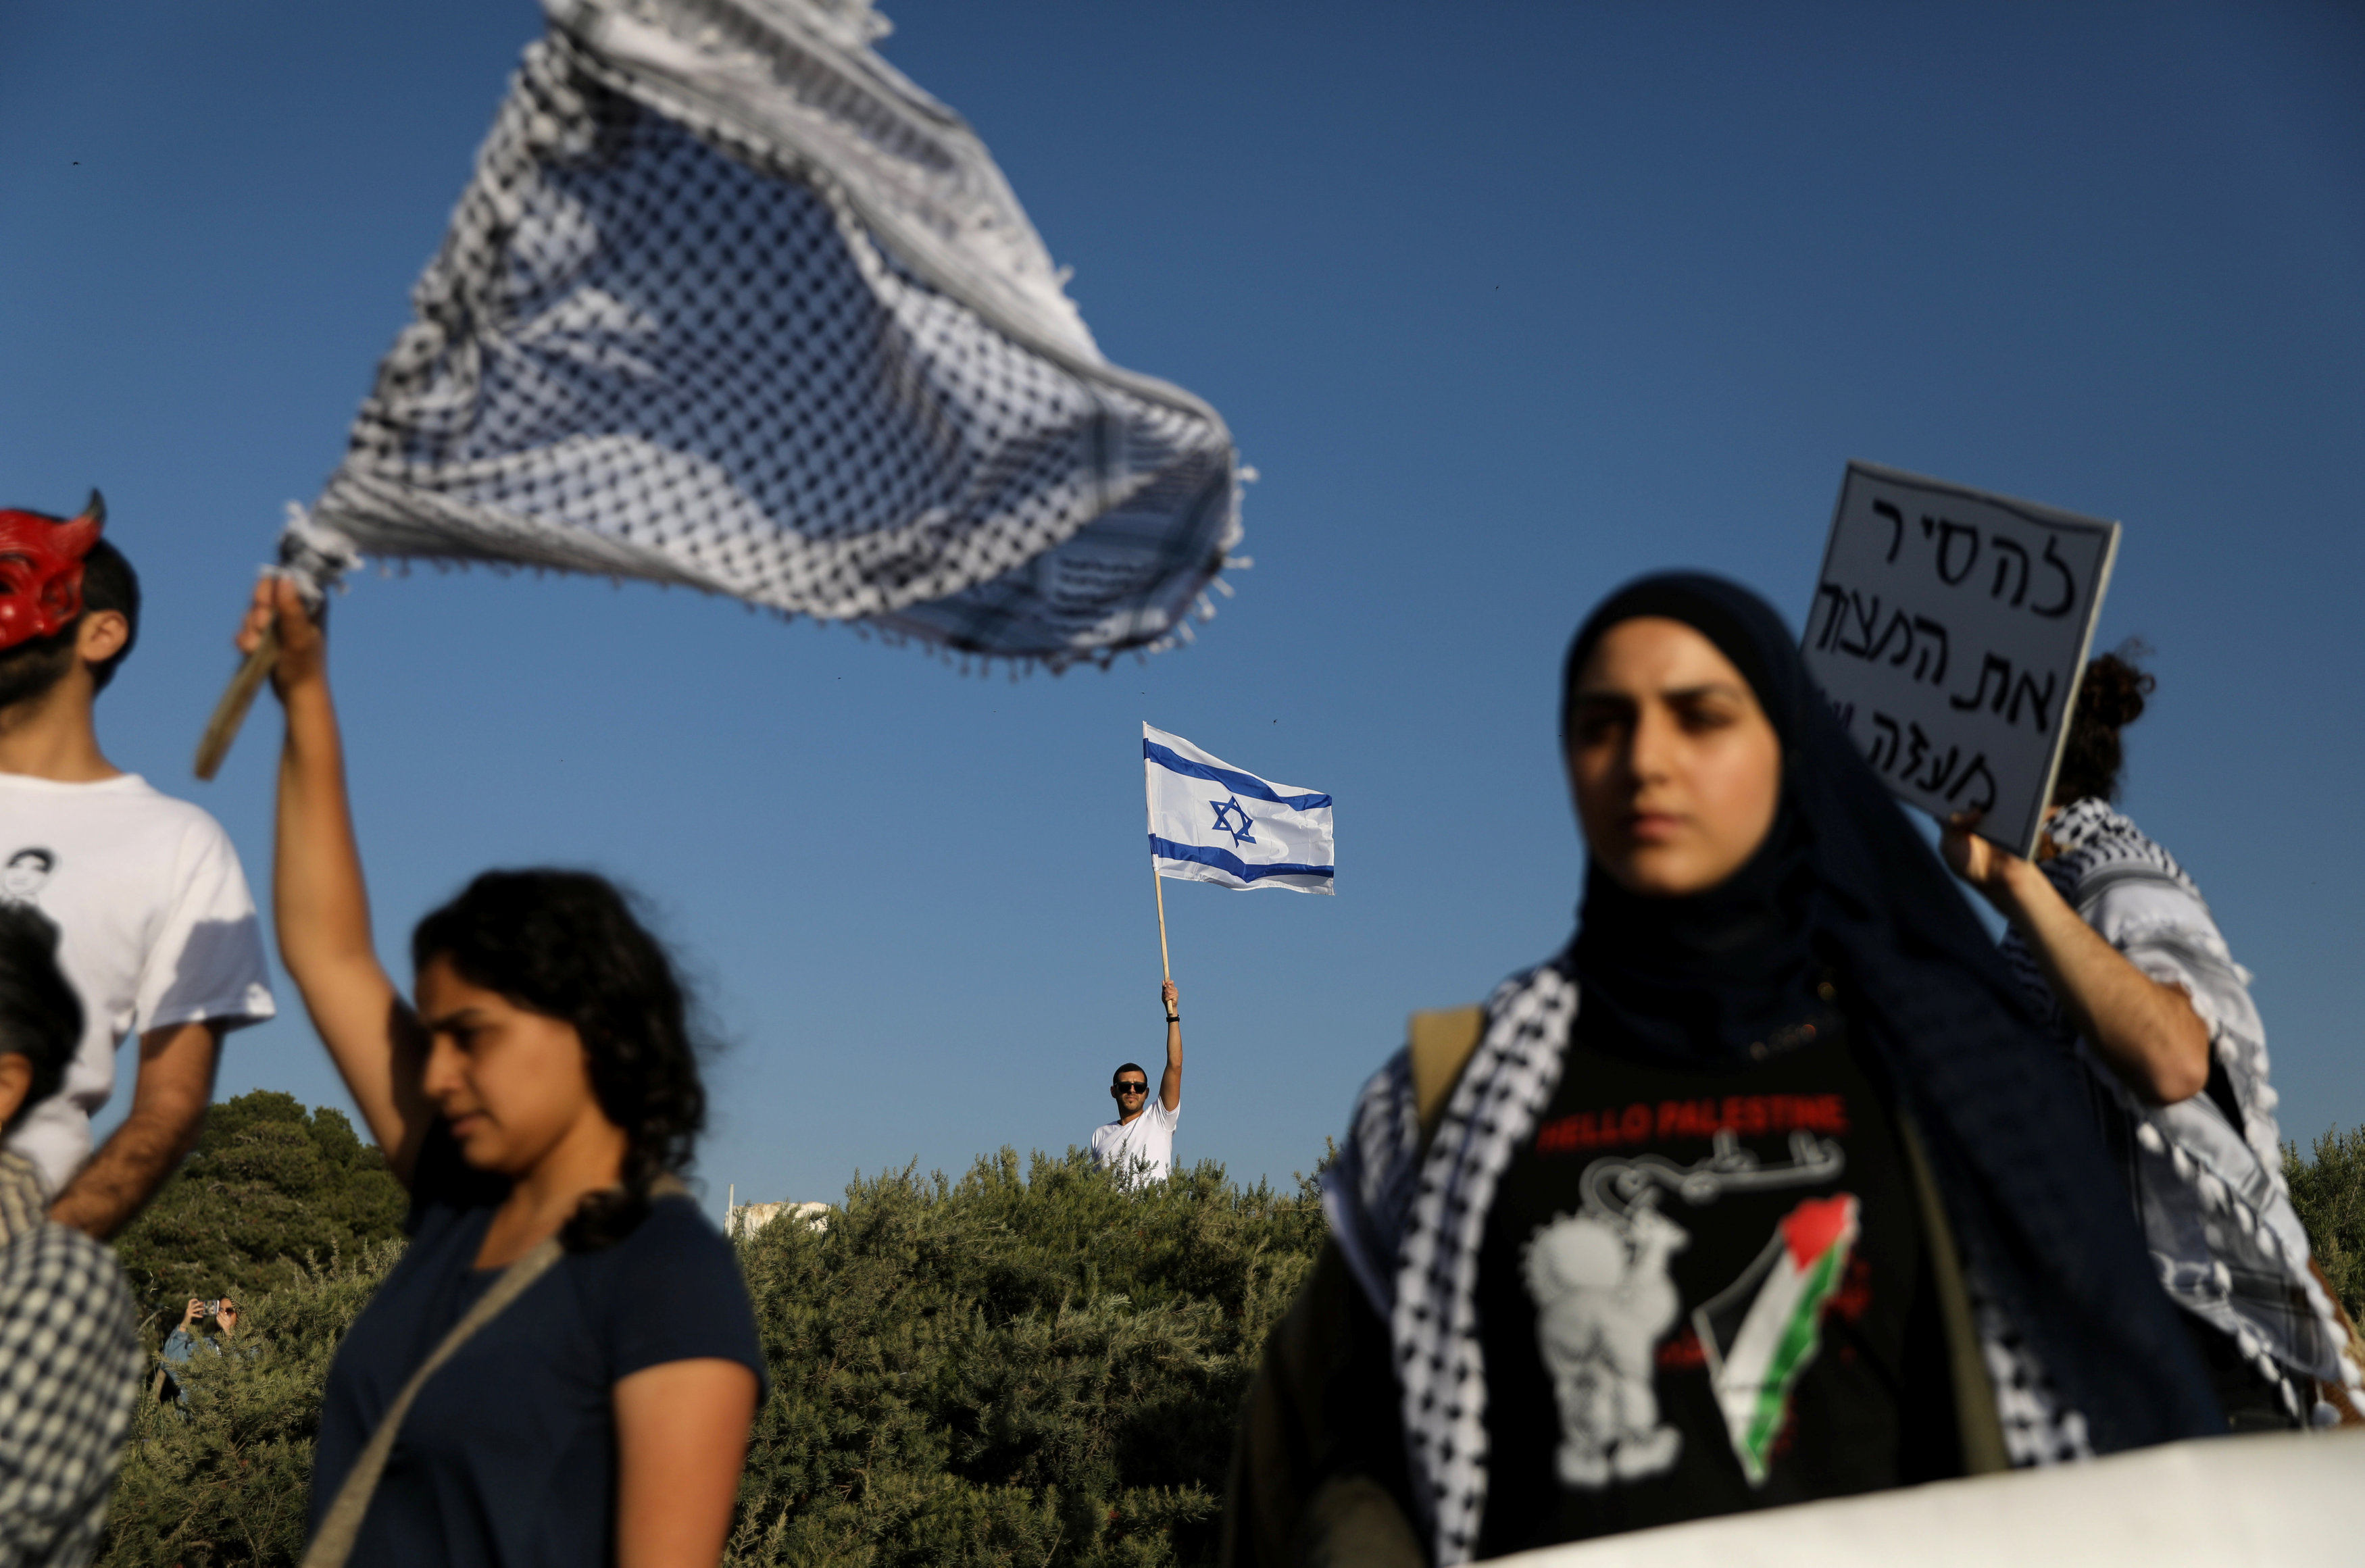 No Gaza inquiry, says Israeli defence minister